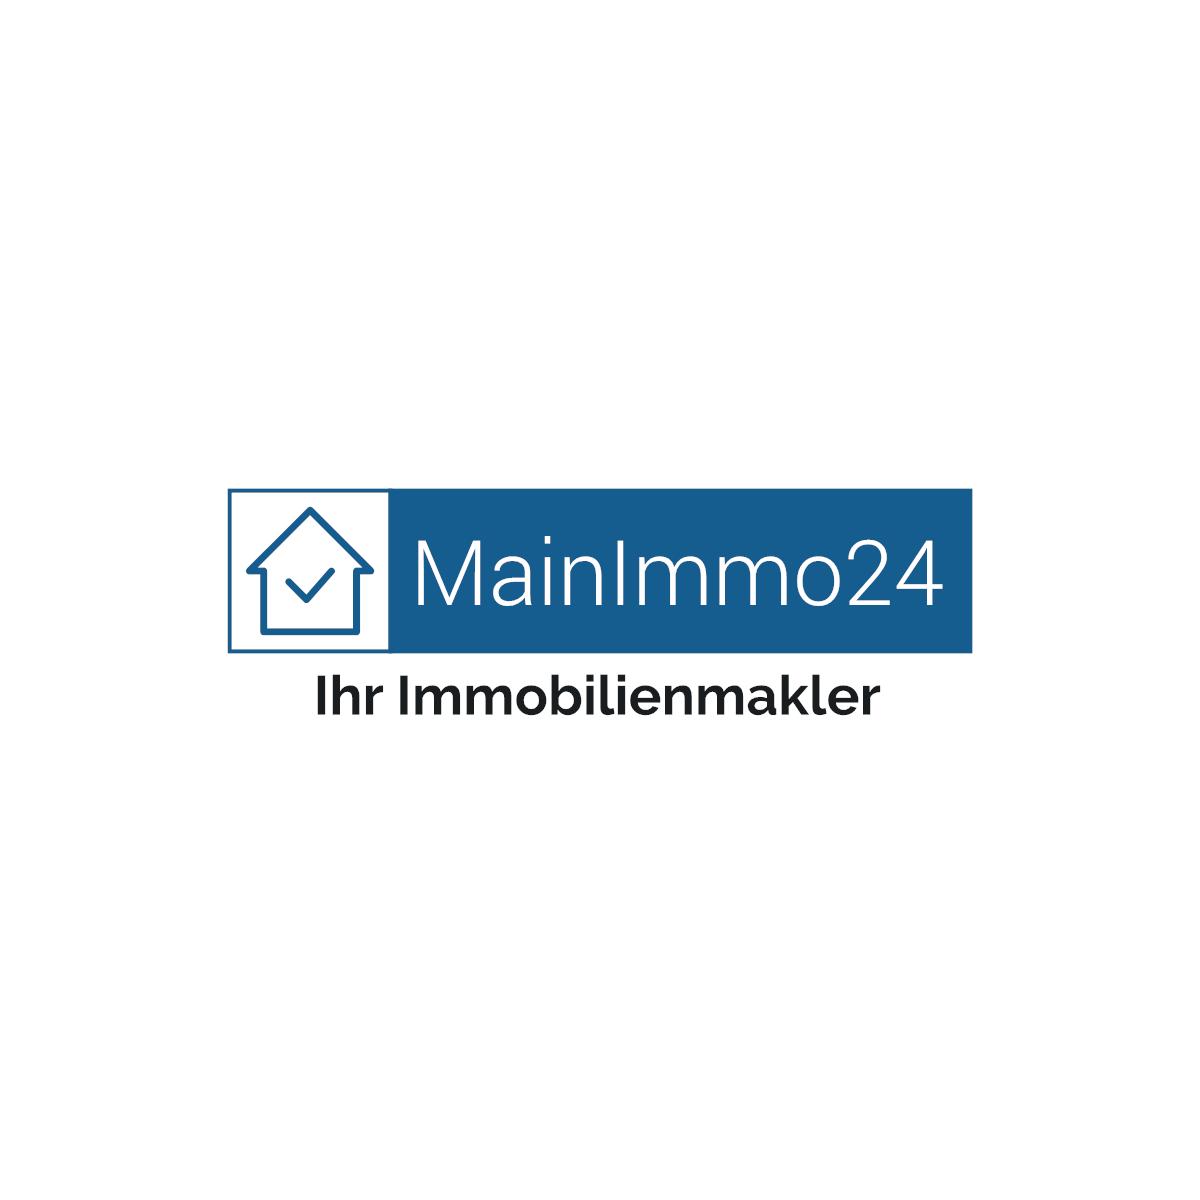 mainimmo24 - Immobilienmakler